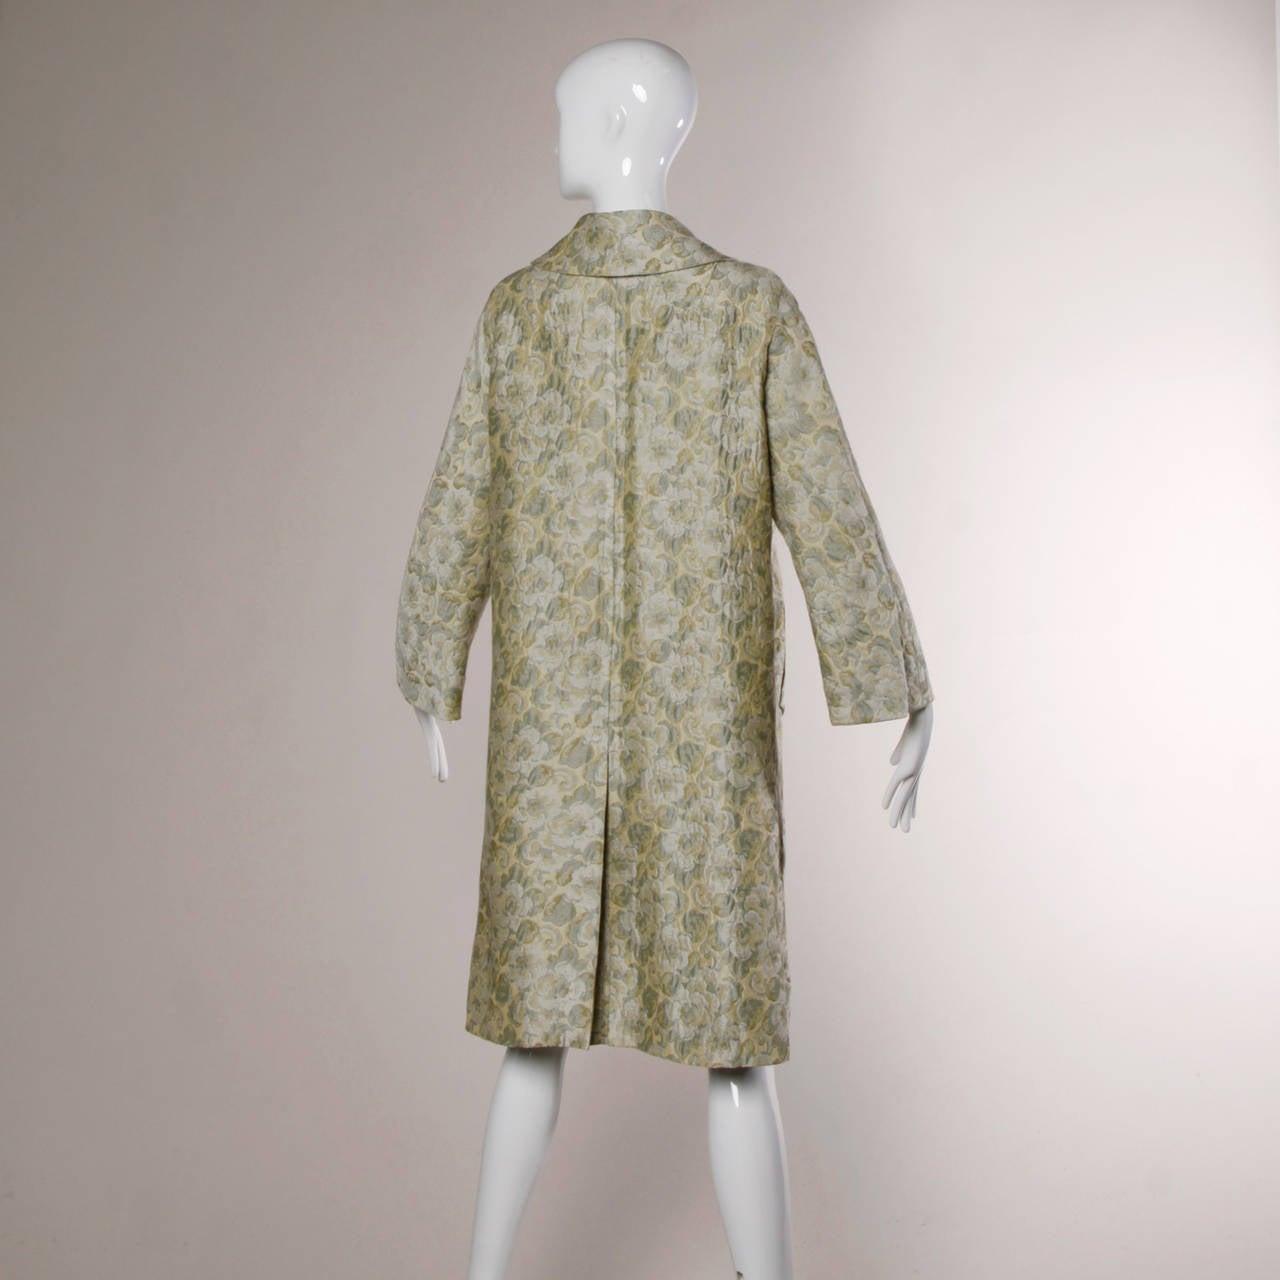 Joseph Magnin 1960s Vintage Metallic Brocade Tapestry Trench Coat 5